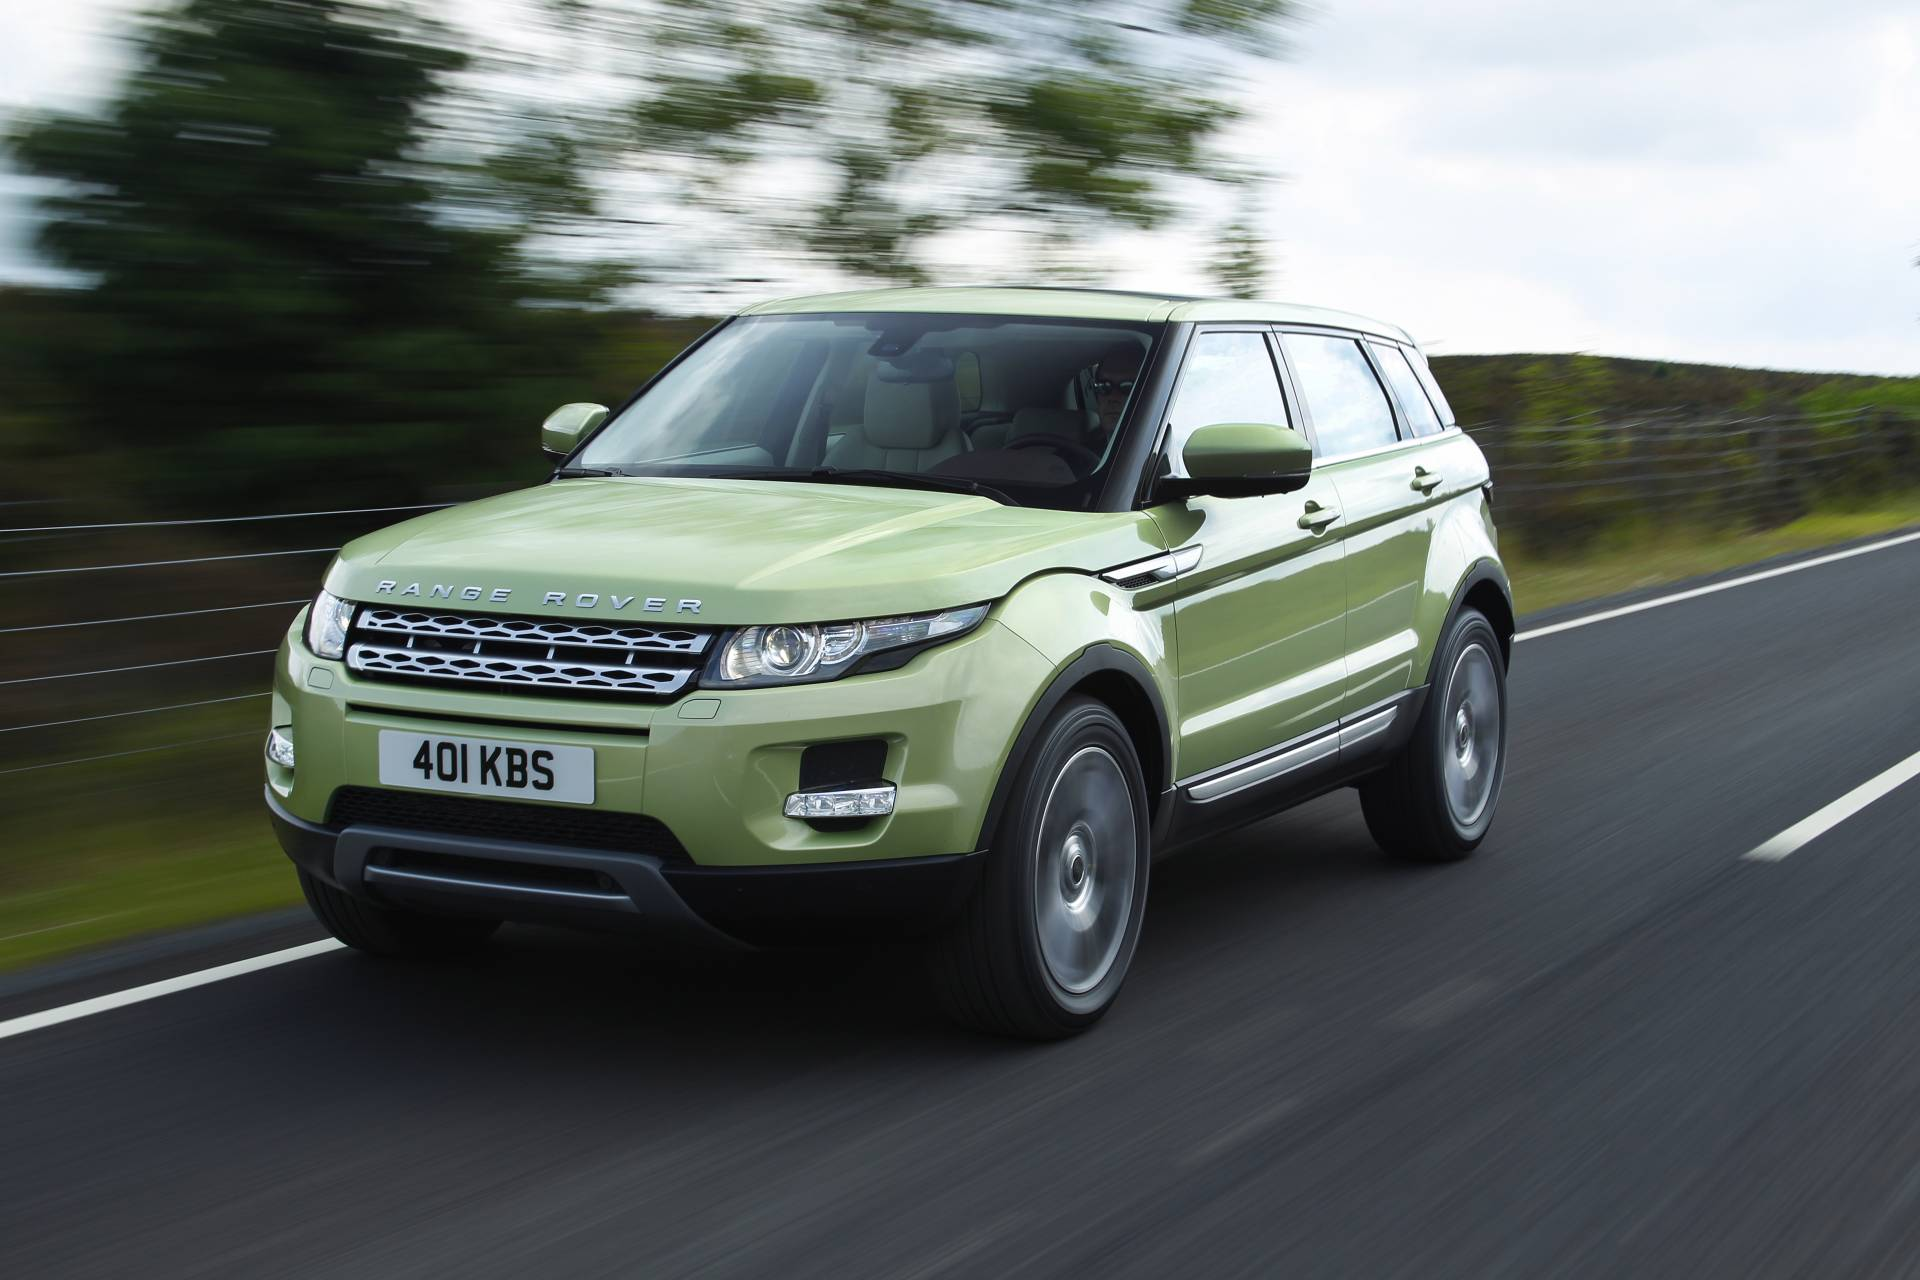 https://www.conceptcarz.com/images/Land%20Rover/2012-Land-Rover-Range-Rover-Evoque-04.jpg